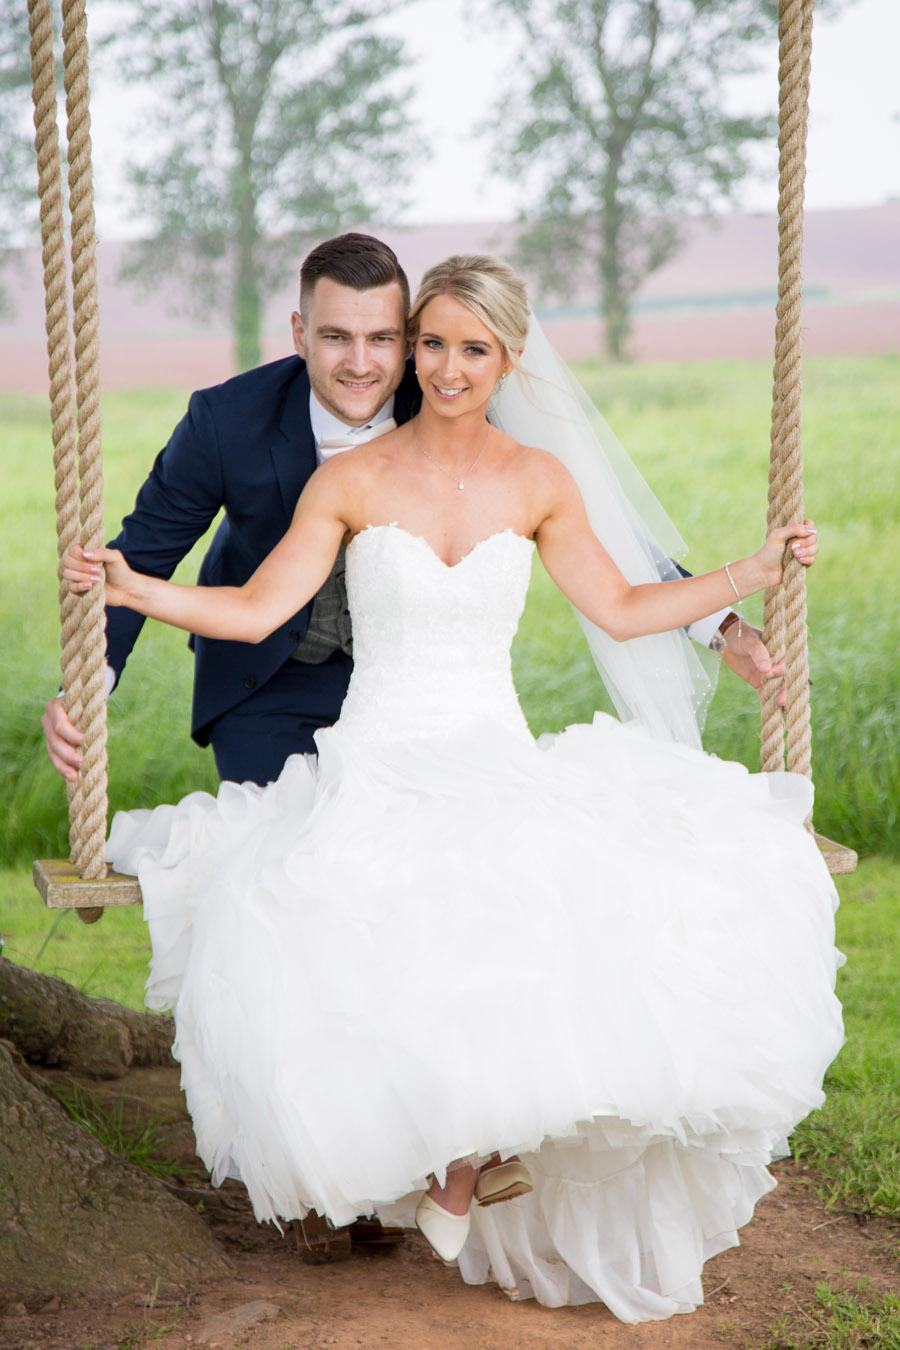 Quantock Lakes wedding styling ideas real wedding photographer Martin Dabek on the English Wedding Blog (23)